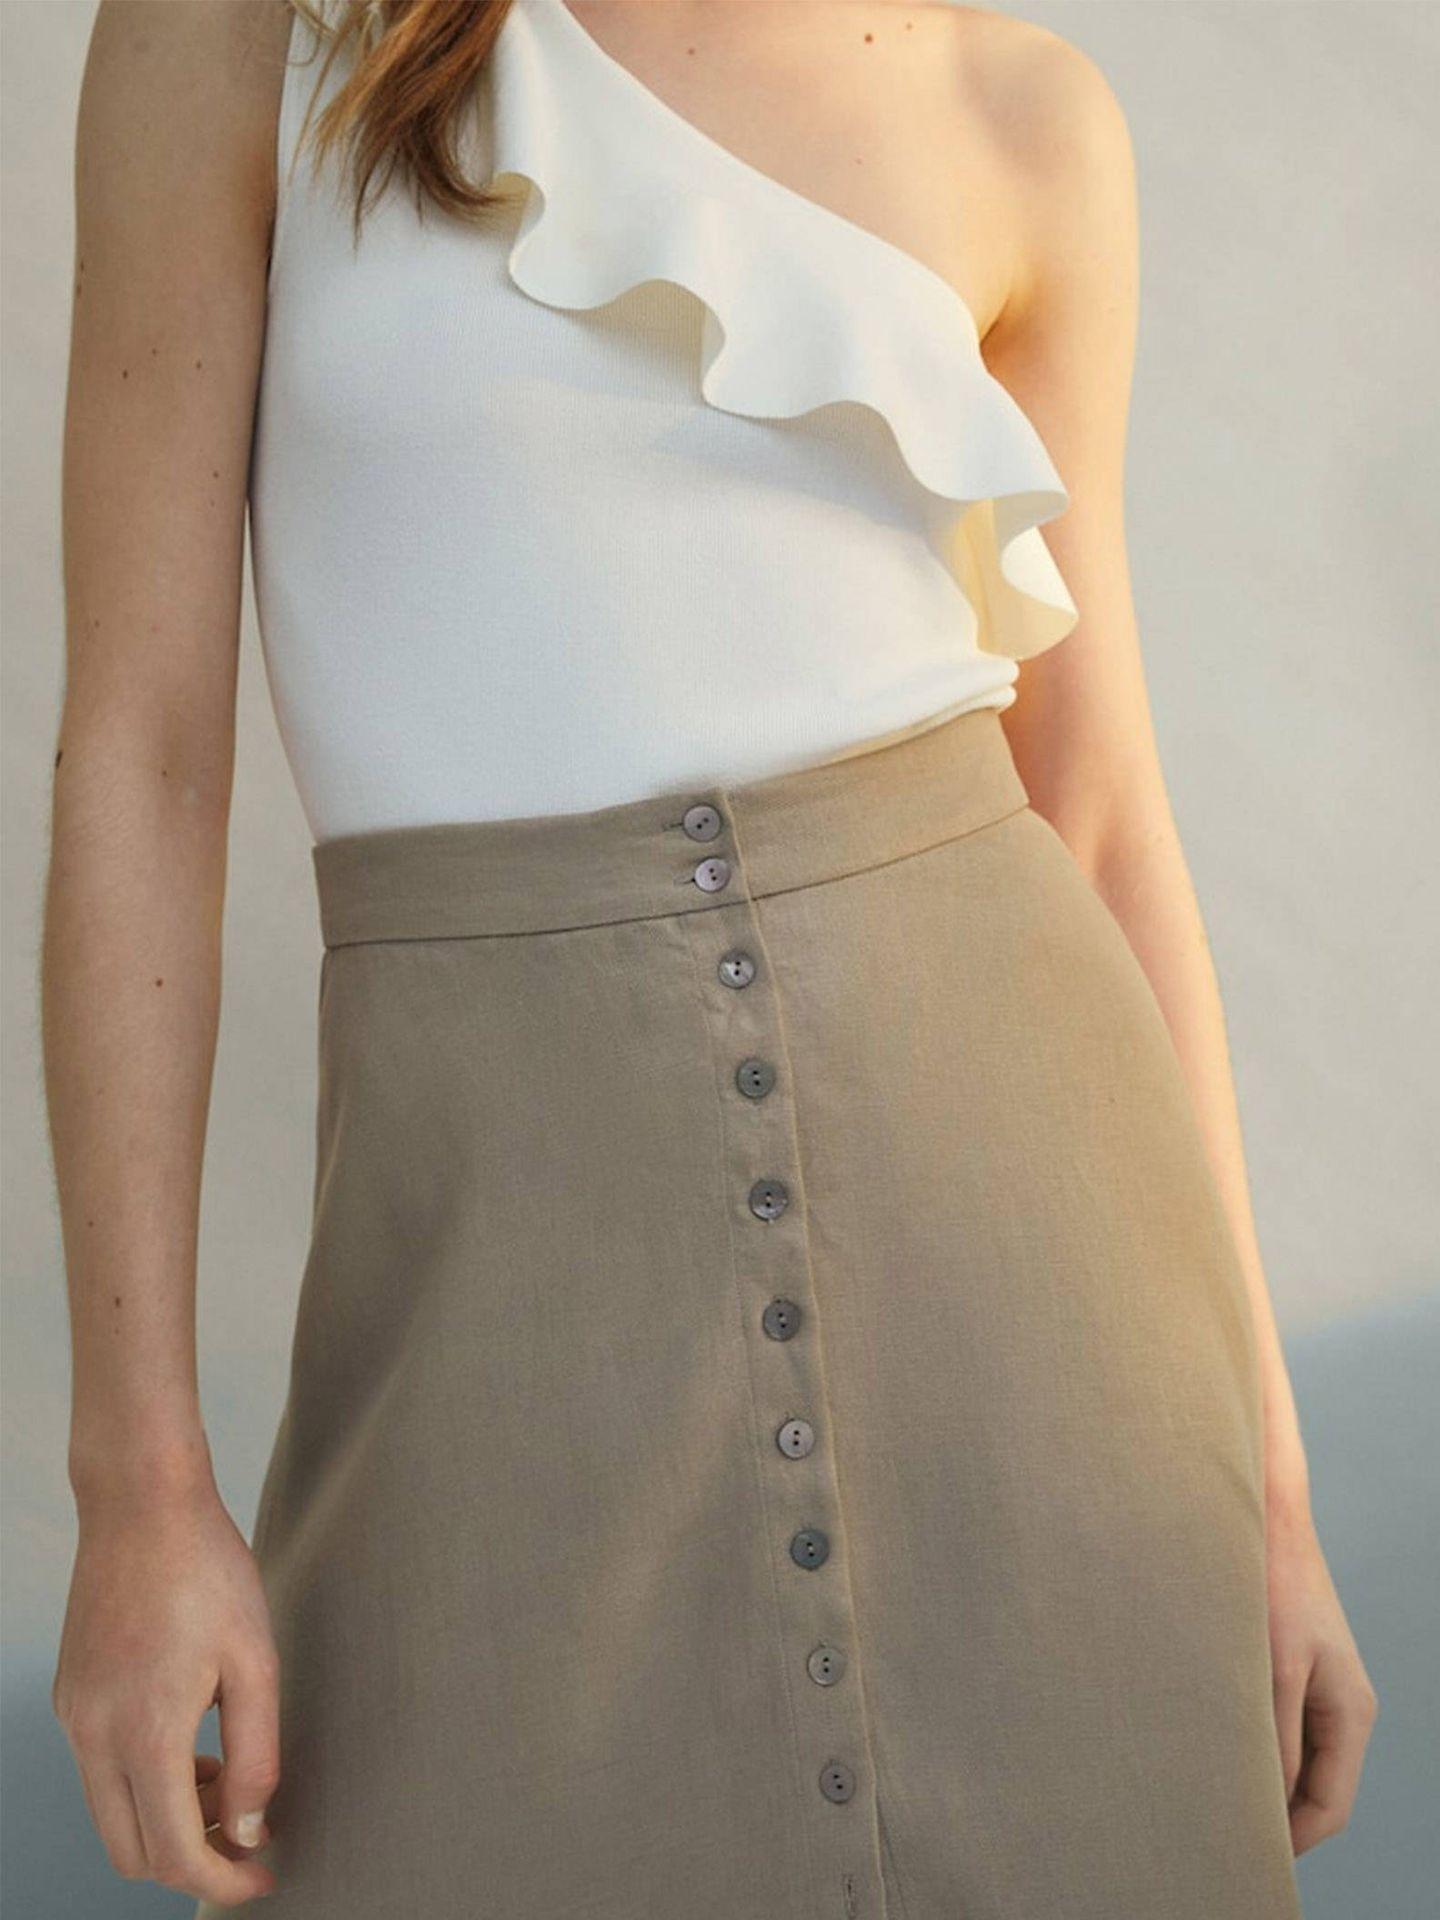 Falda de Massimo Dutti. (Cortesía)